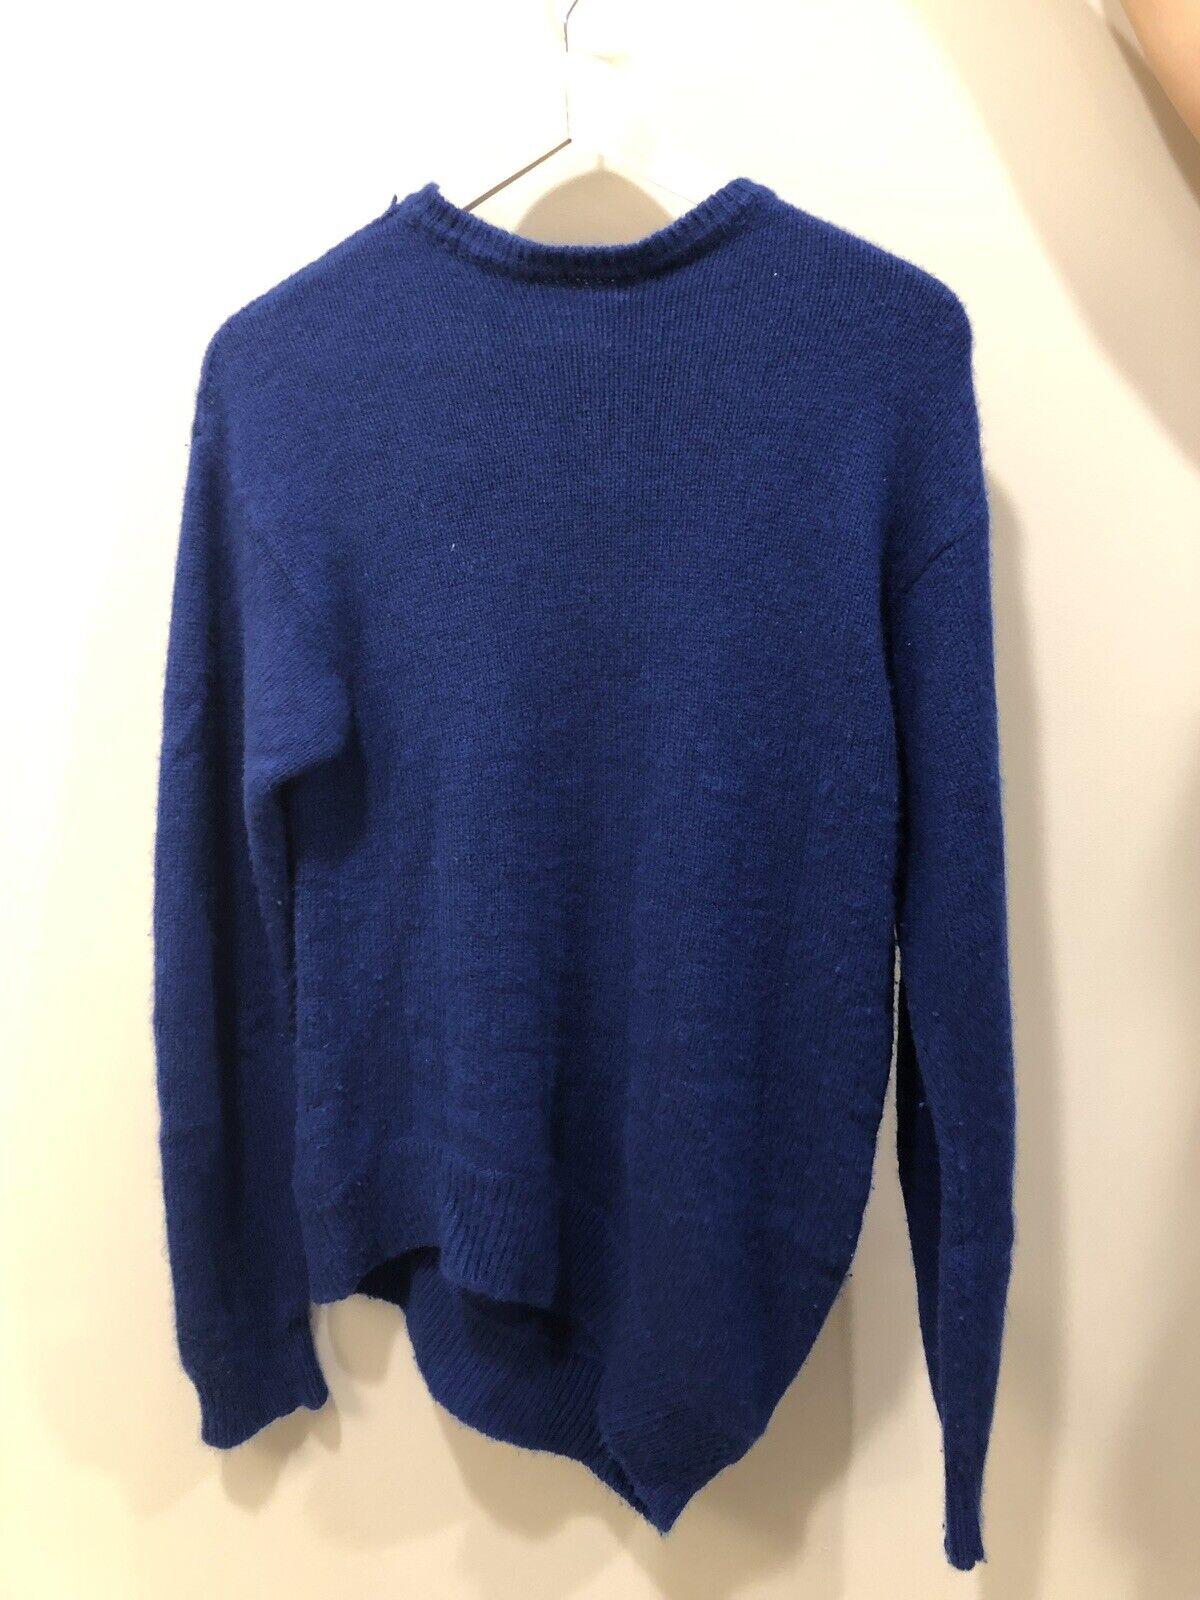 CELINE daMänner Sapphire Blau CASHMERE  Crewneck Lange Sleeve Sweater M